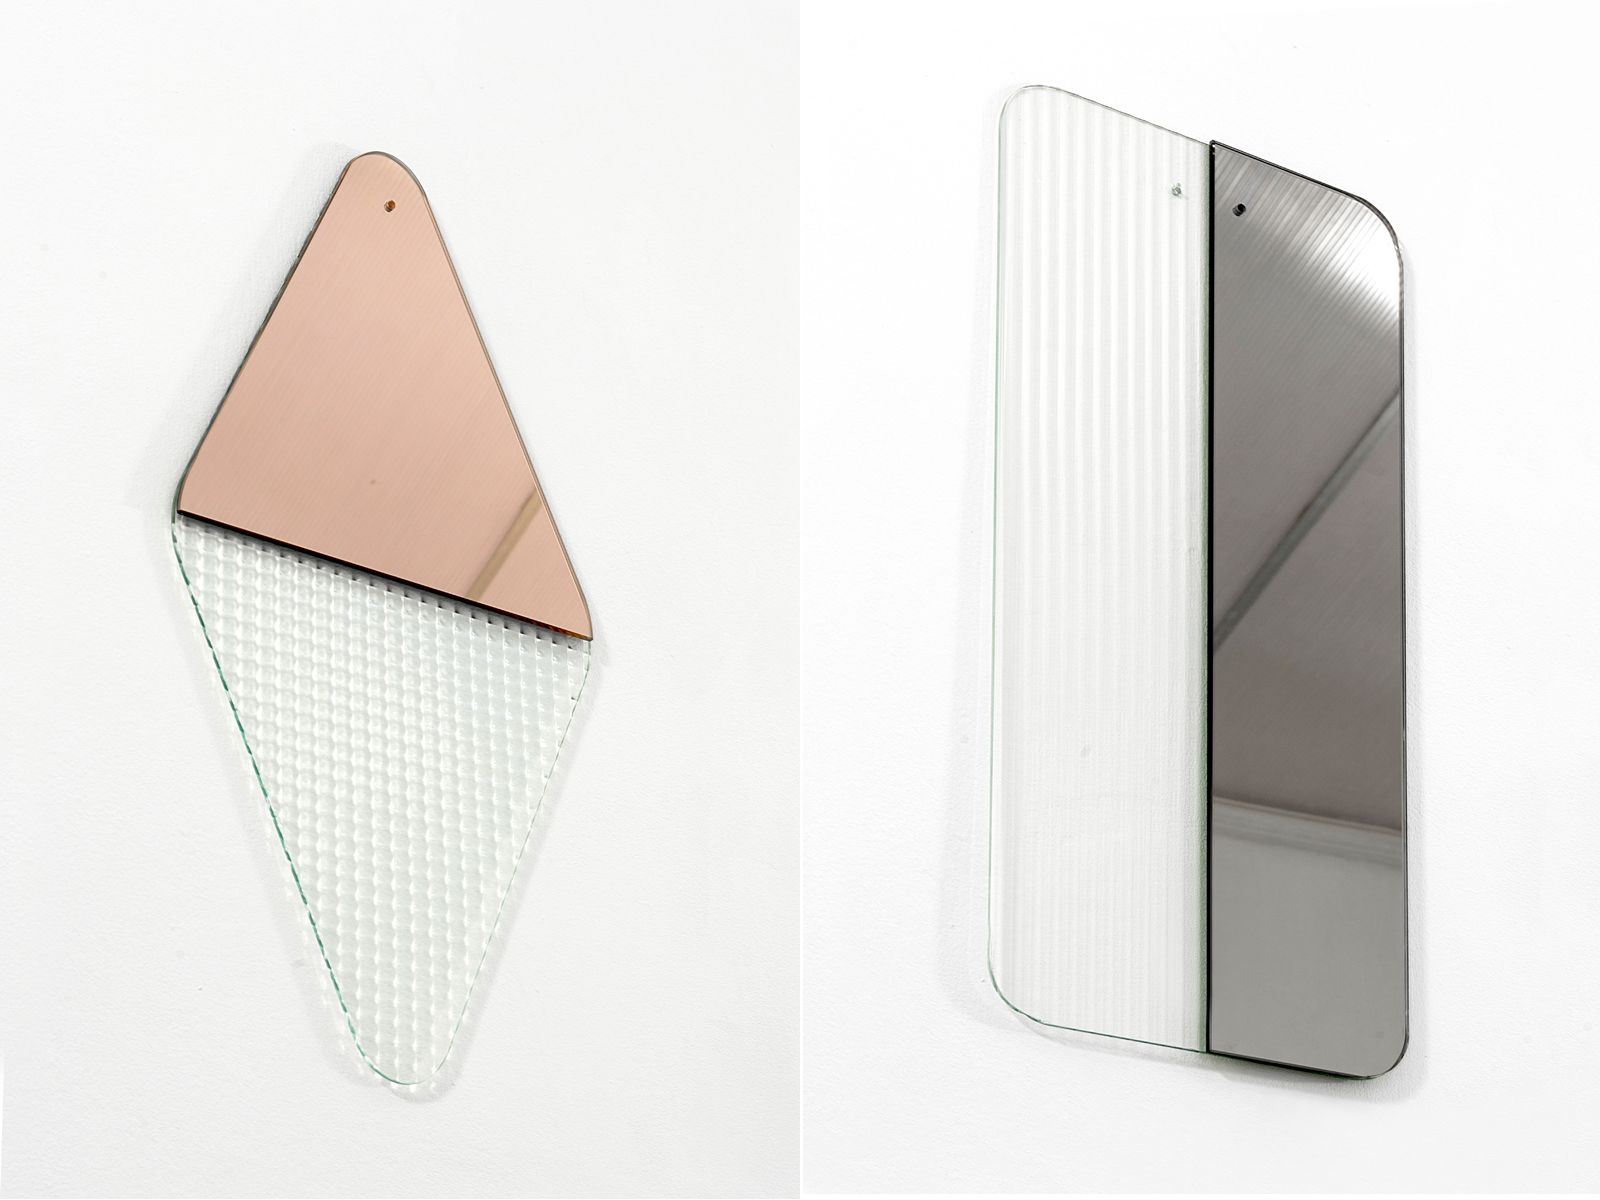 copper + gunmetal + clear--obei obei mirror